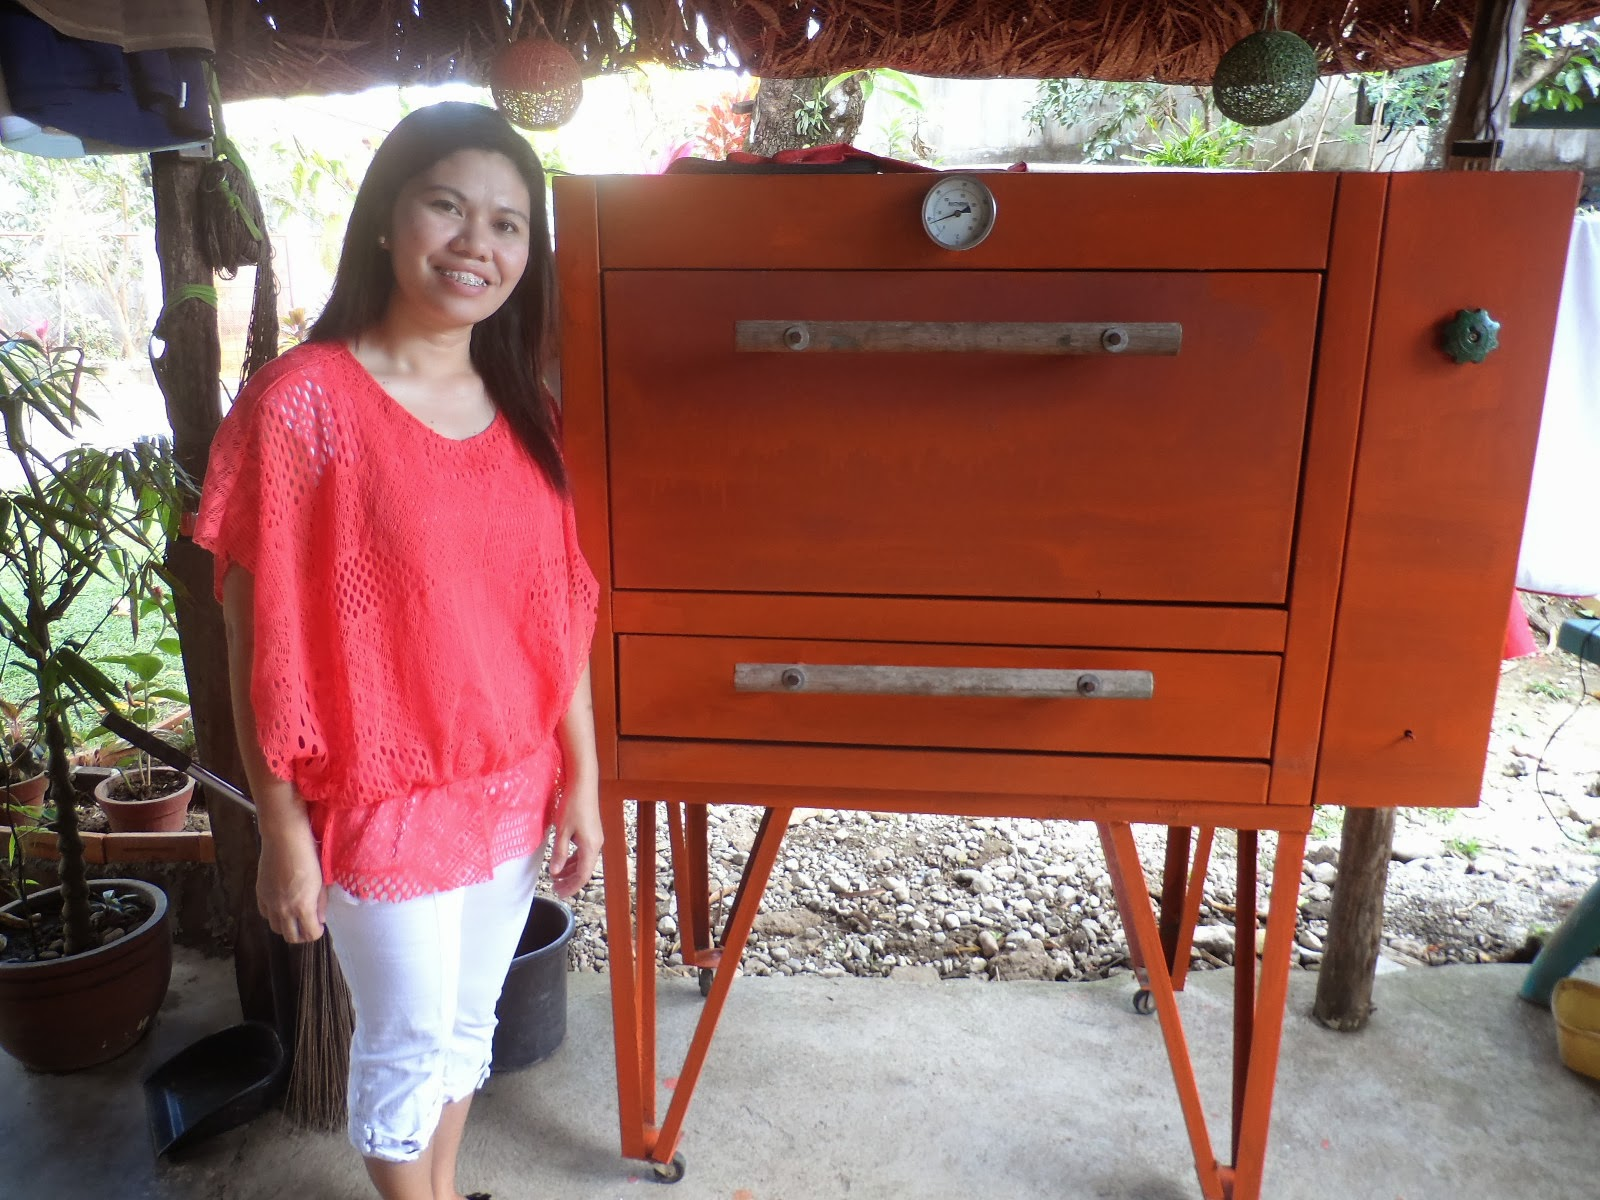 Industrial oven philippines